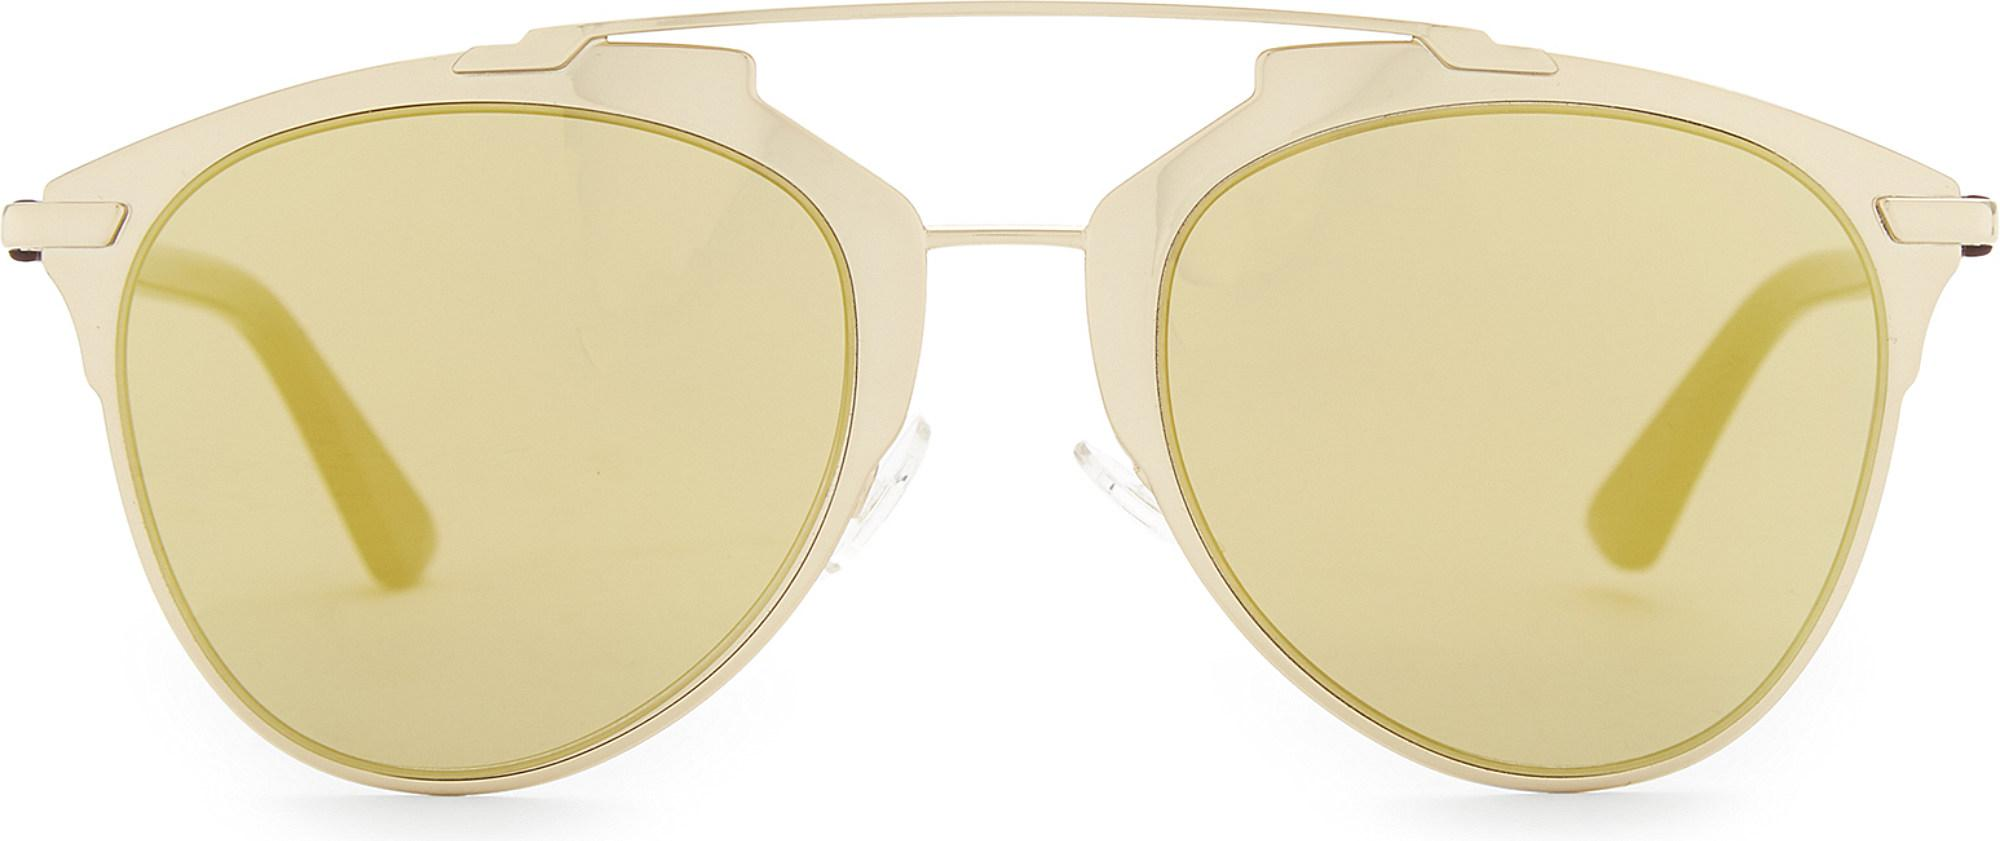 a4aa3f5bdf26fa Dior Reflected Oval Sunglasses in Metallic - Lyst